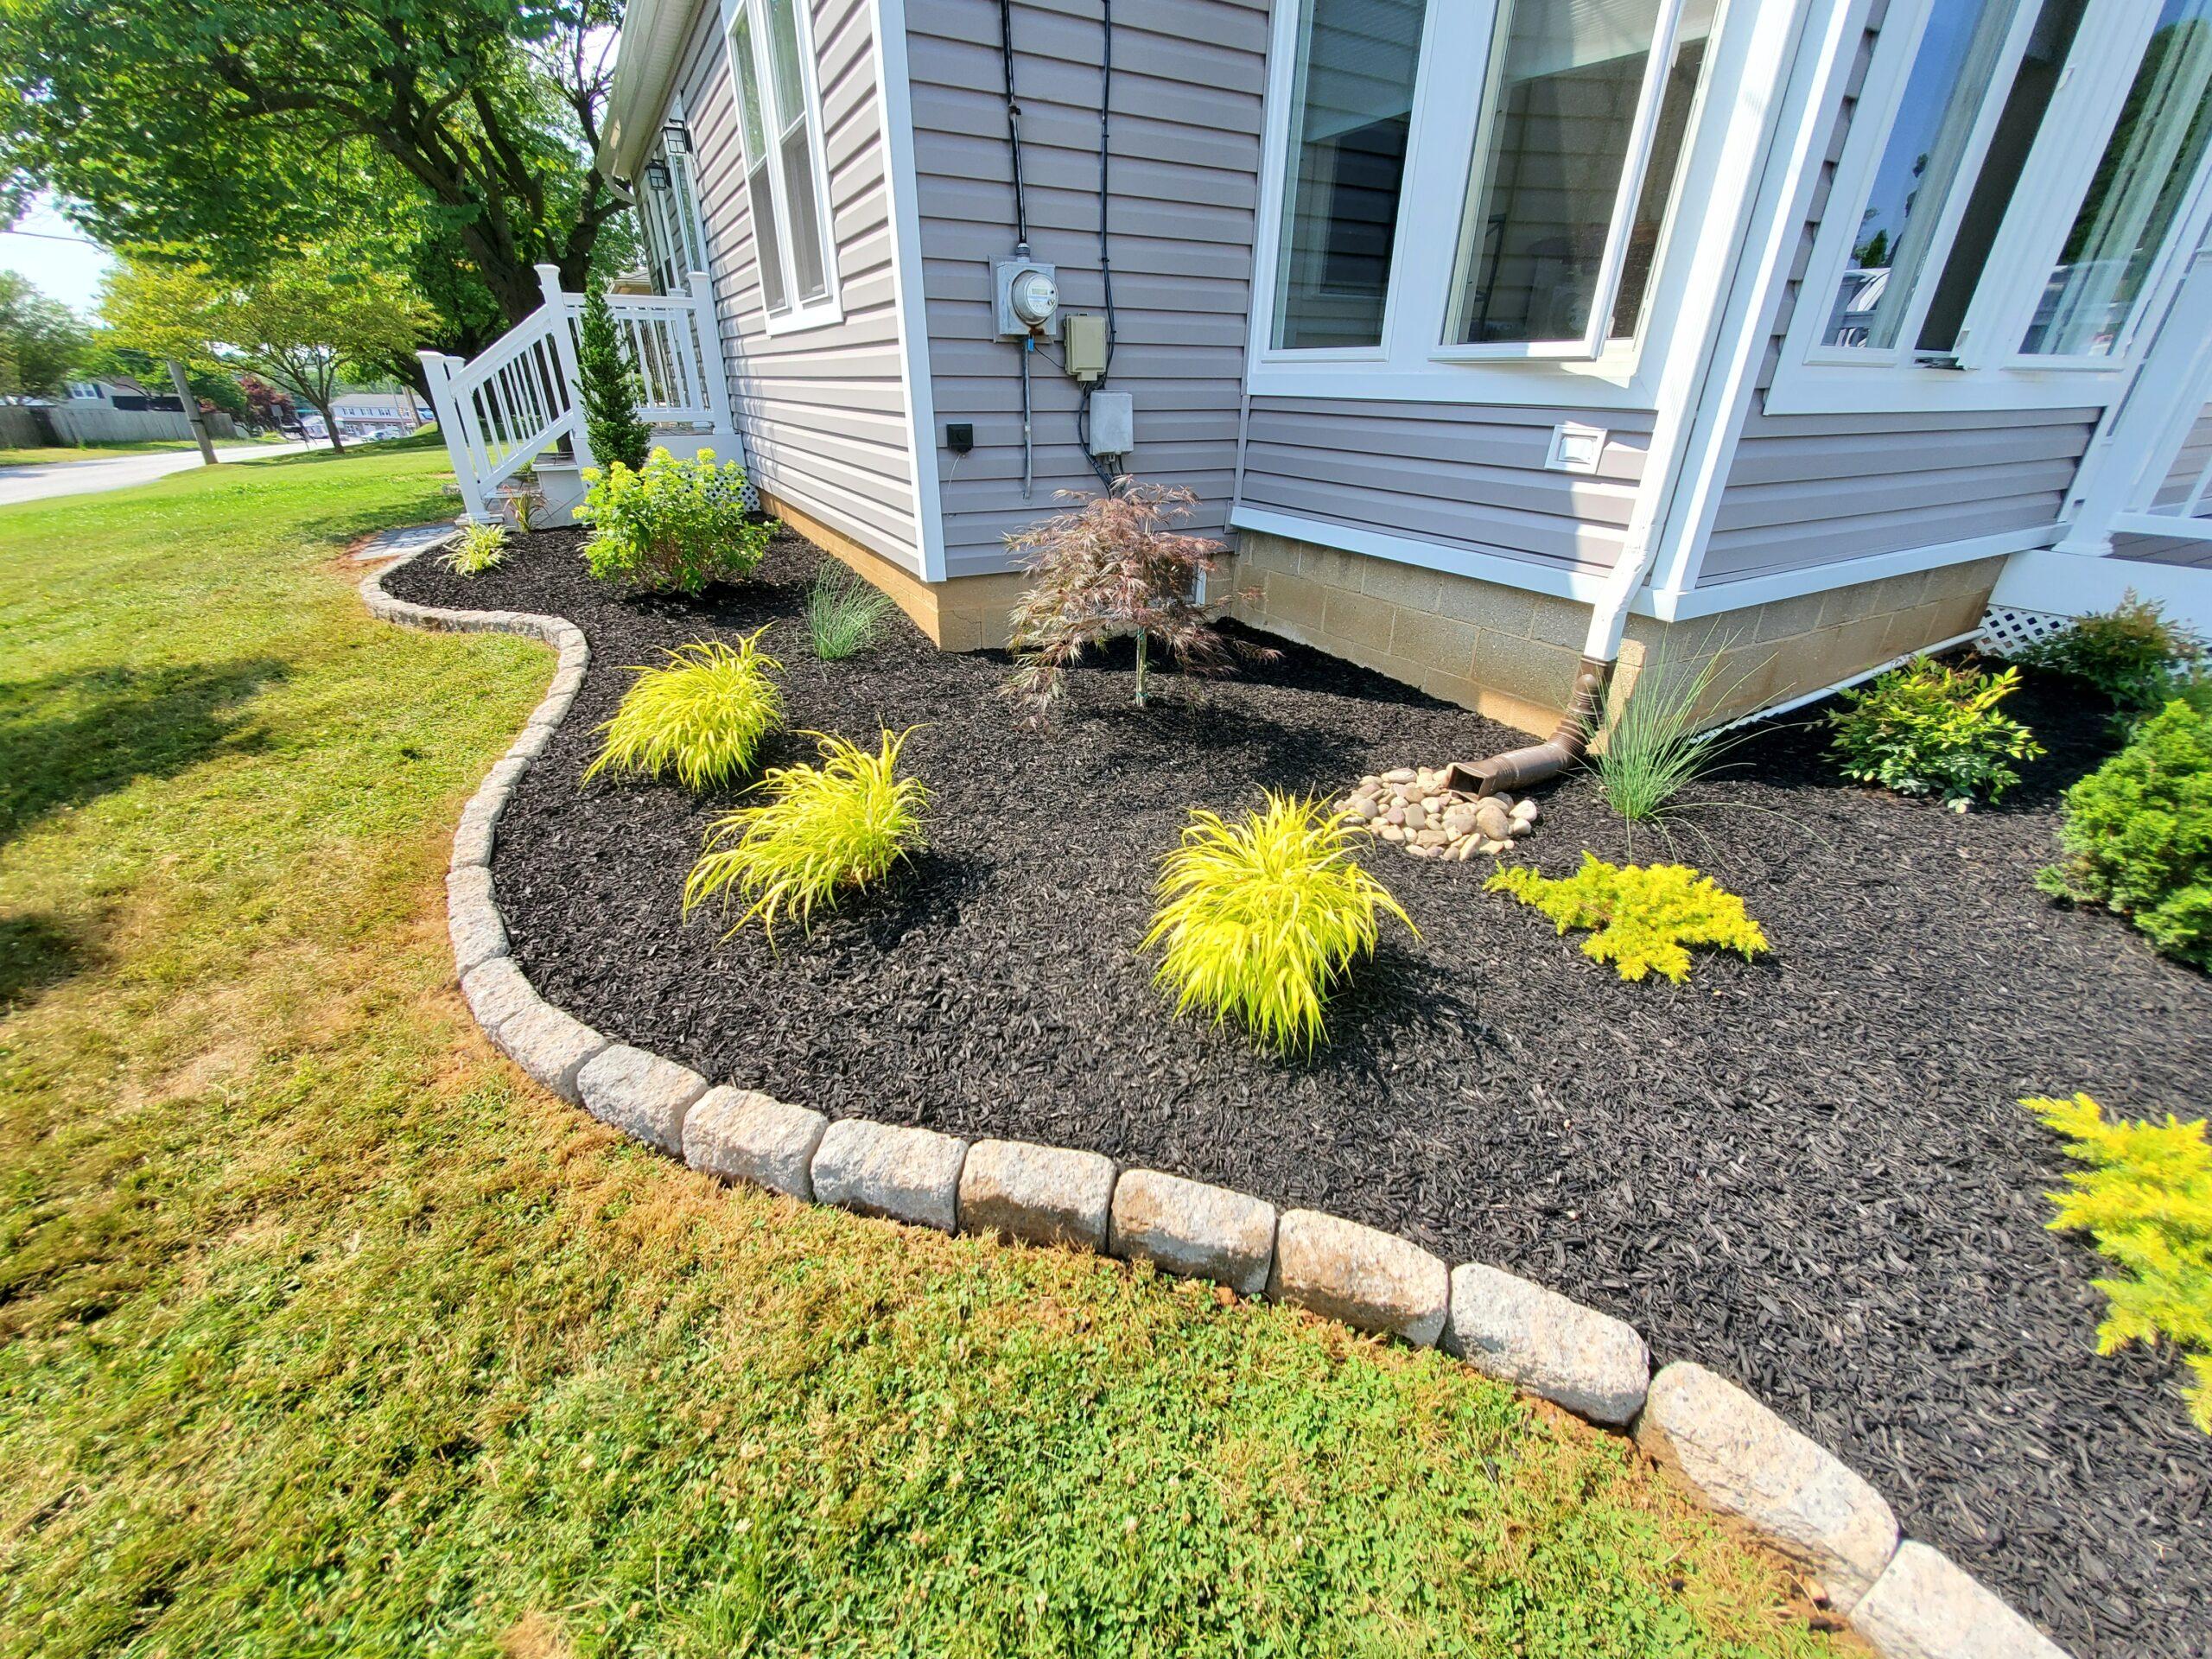 Landscapers - Hanover, PA - Hanover Landscaping Design Contractors - DREAMscape's